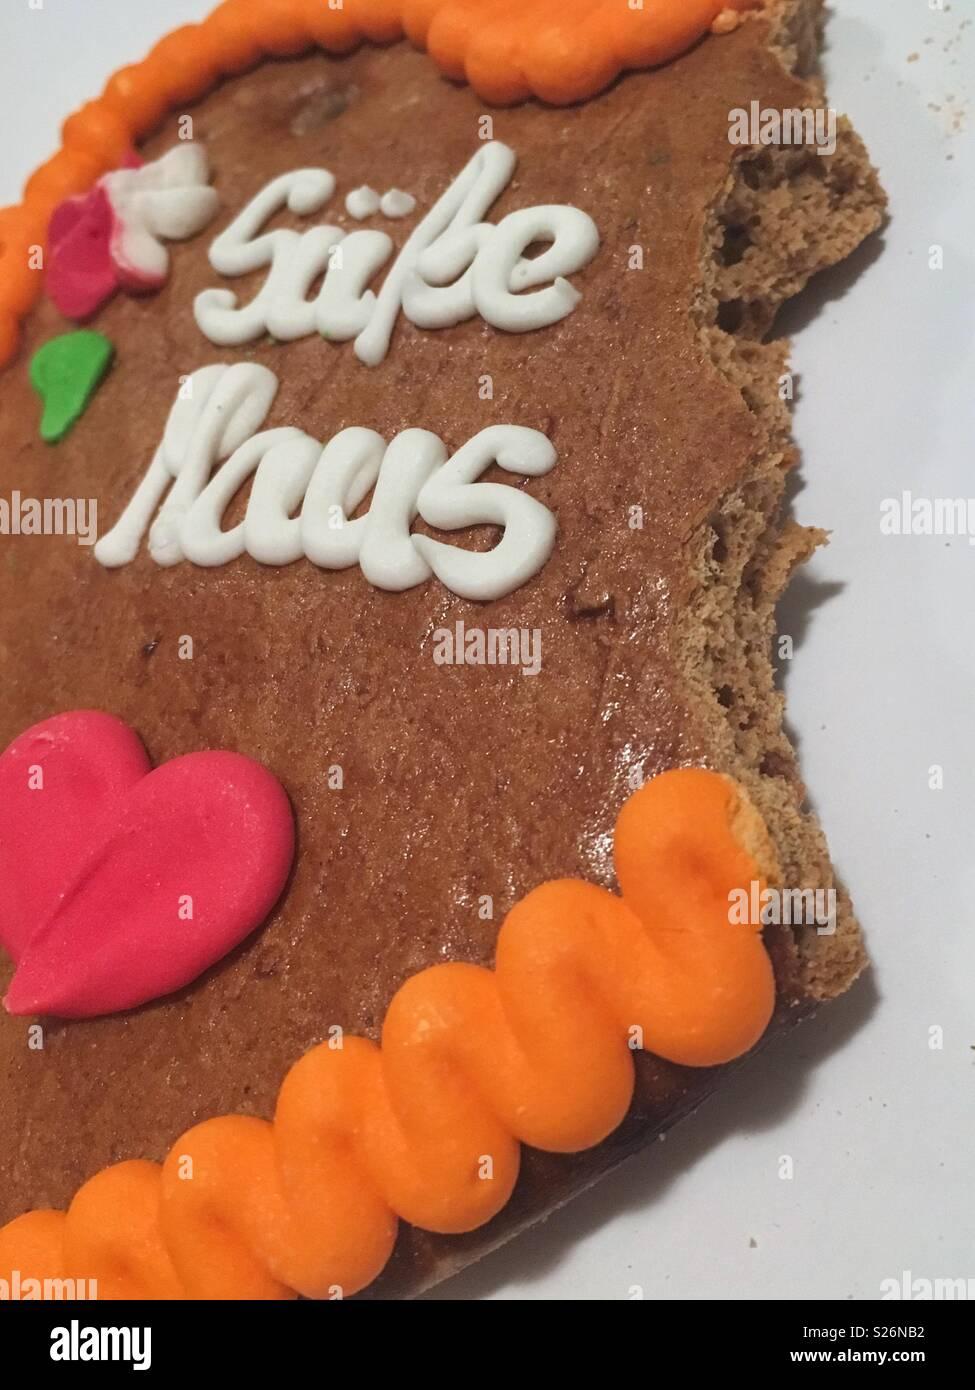 "Lebkuchenherz ""Süße Maus"" - Gingerbread Heart 'Sweet Mouse' - Stock Image"